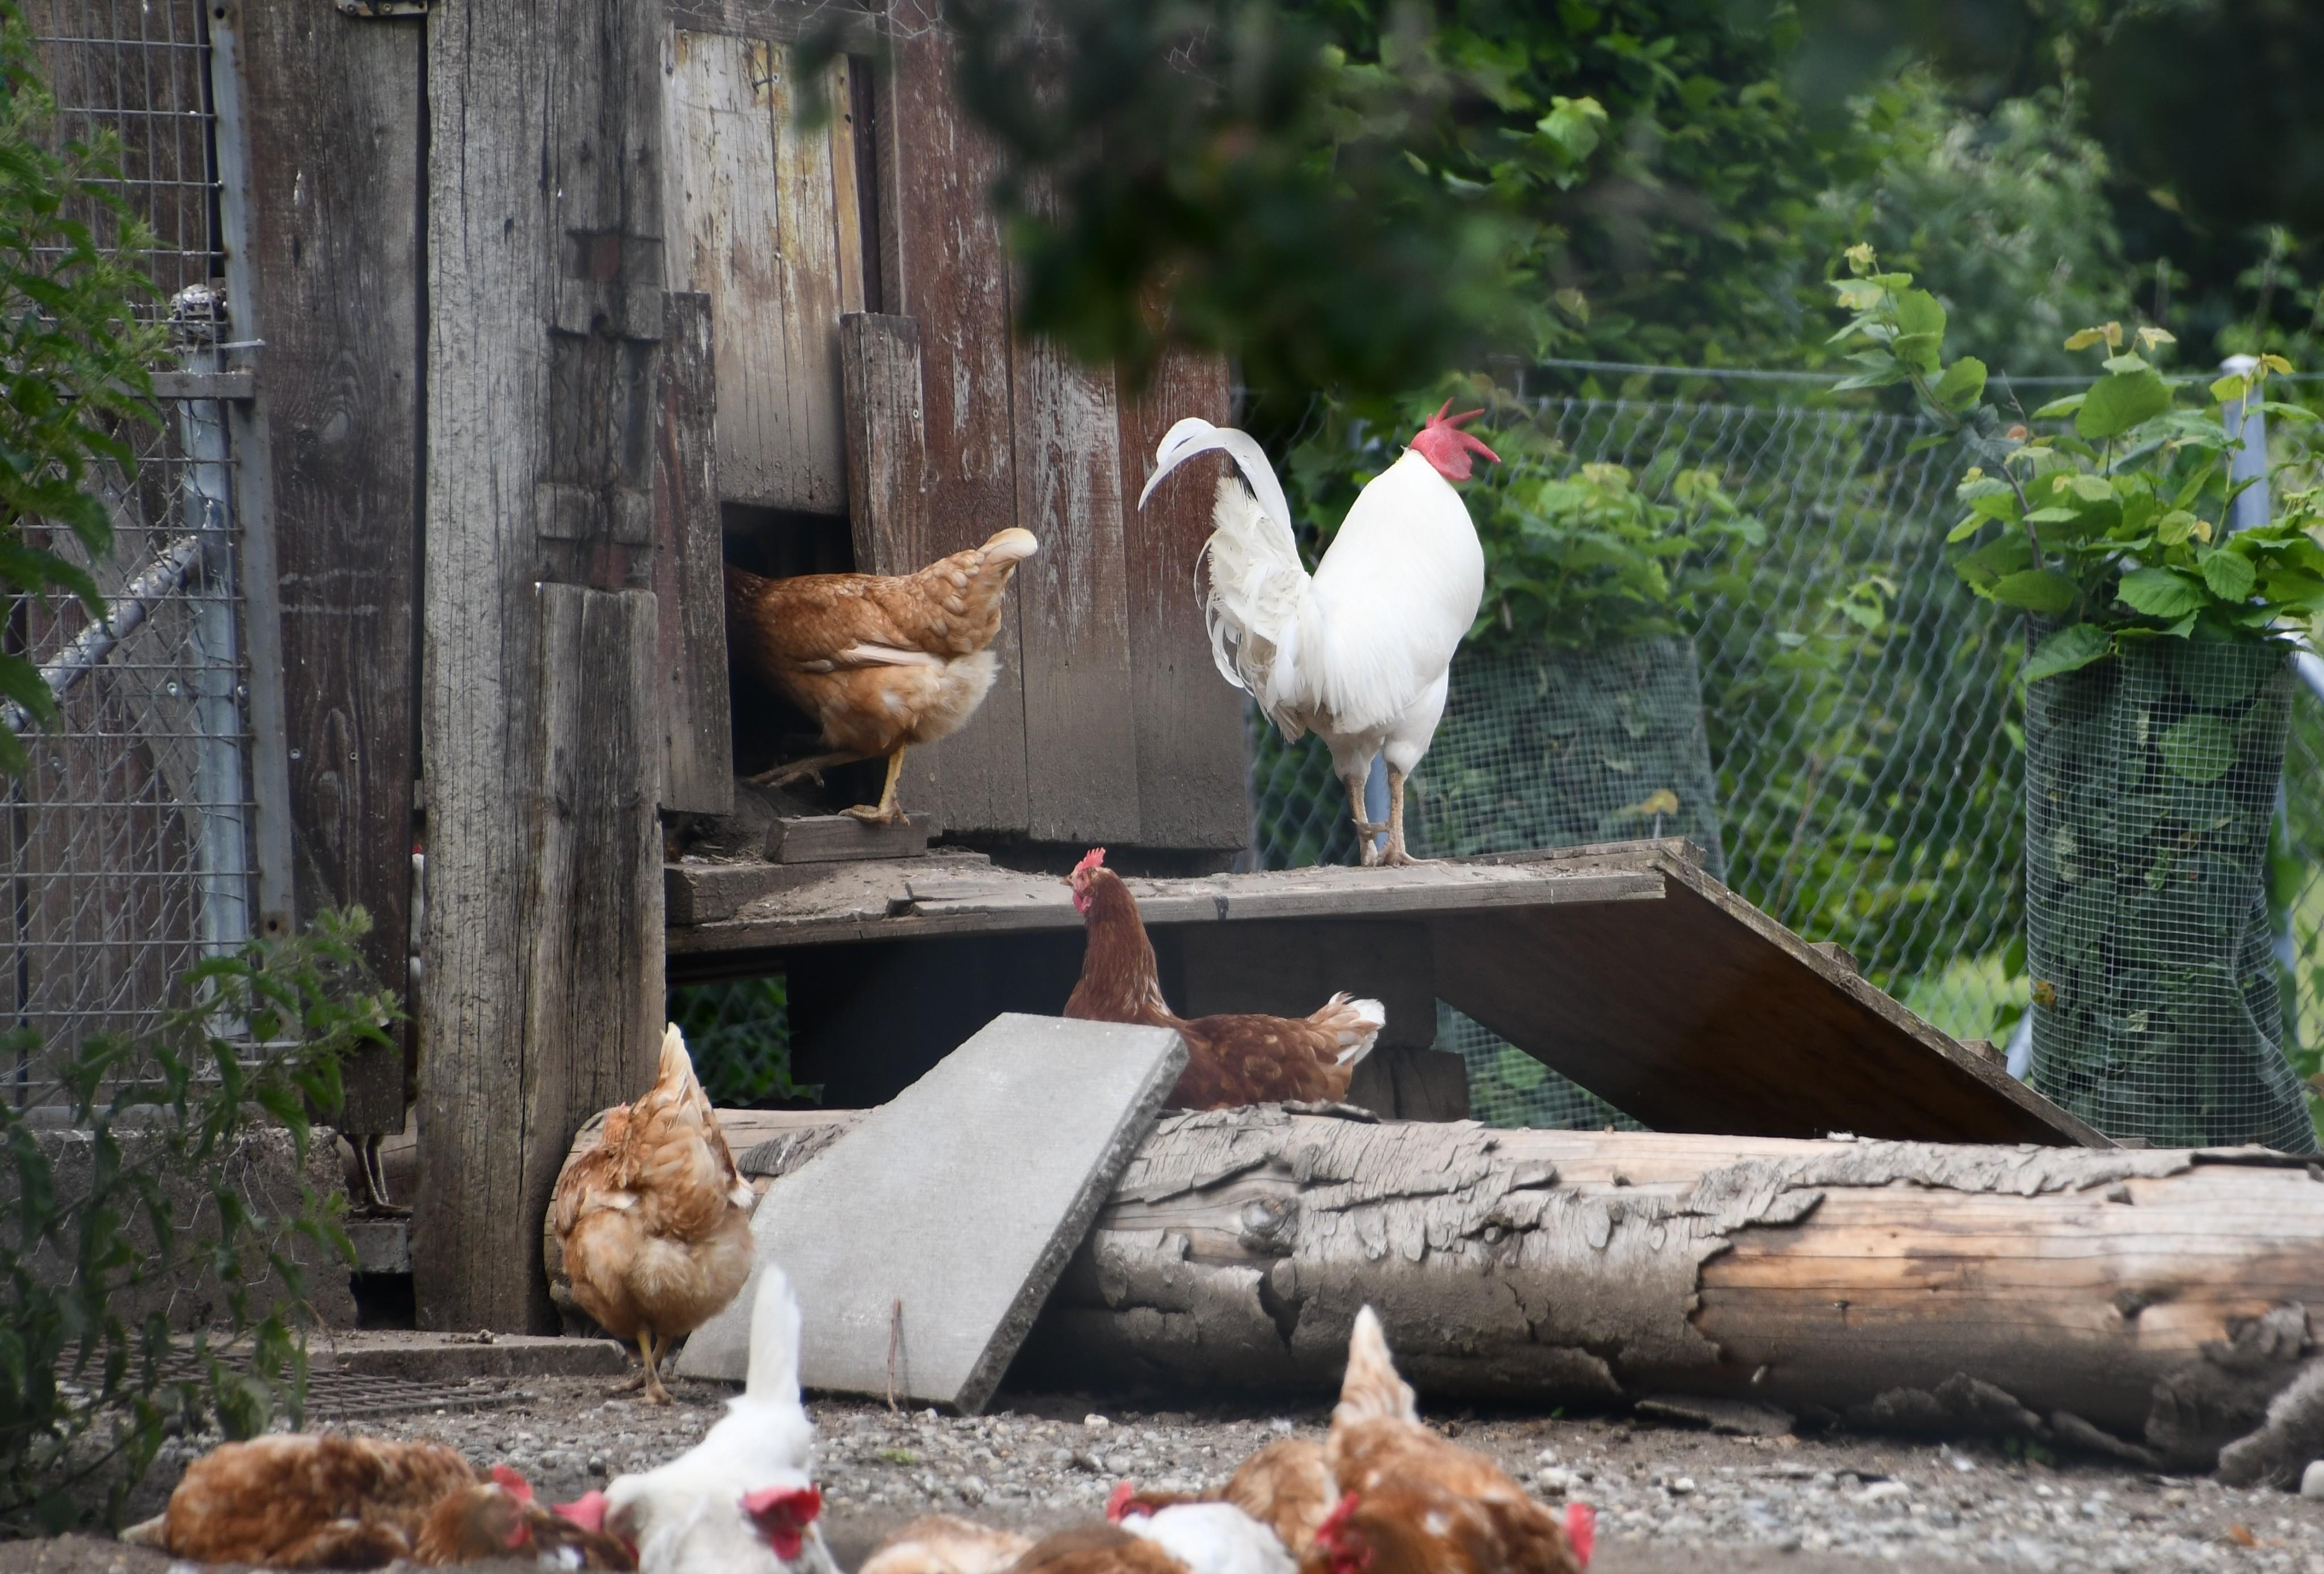 chickens-22.06-3